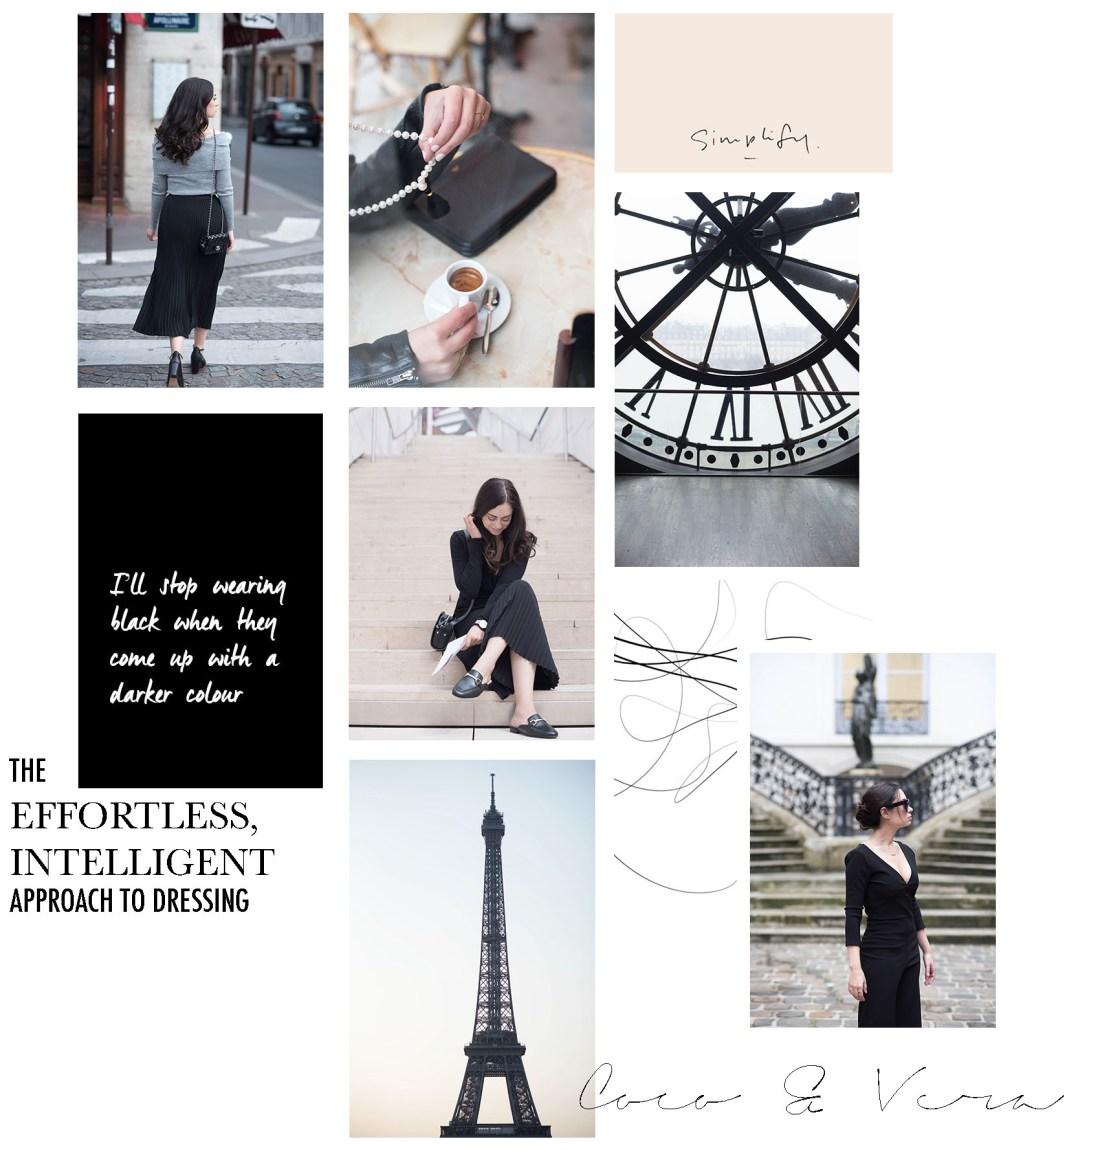 Coco & Vera, a Winnipeg- and Paris-based fashion blog by Cee Fardoe